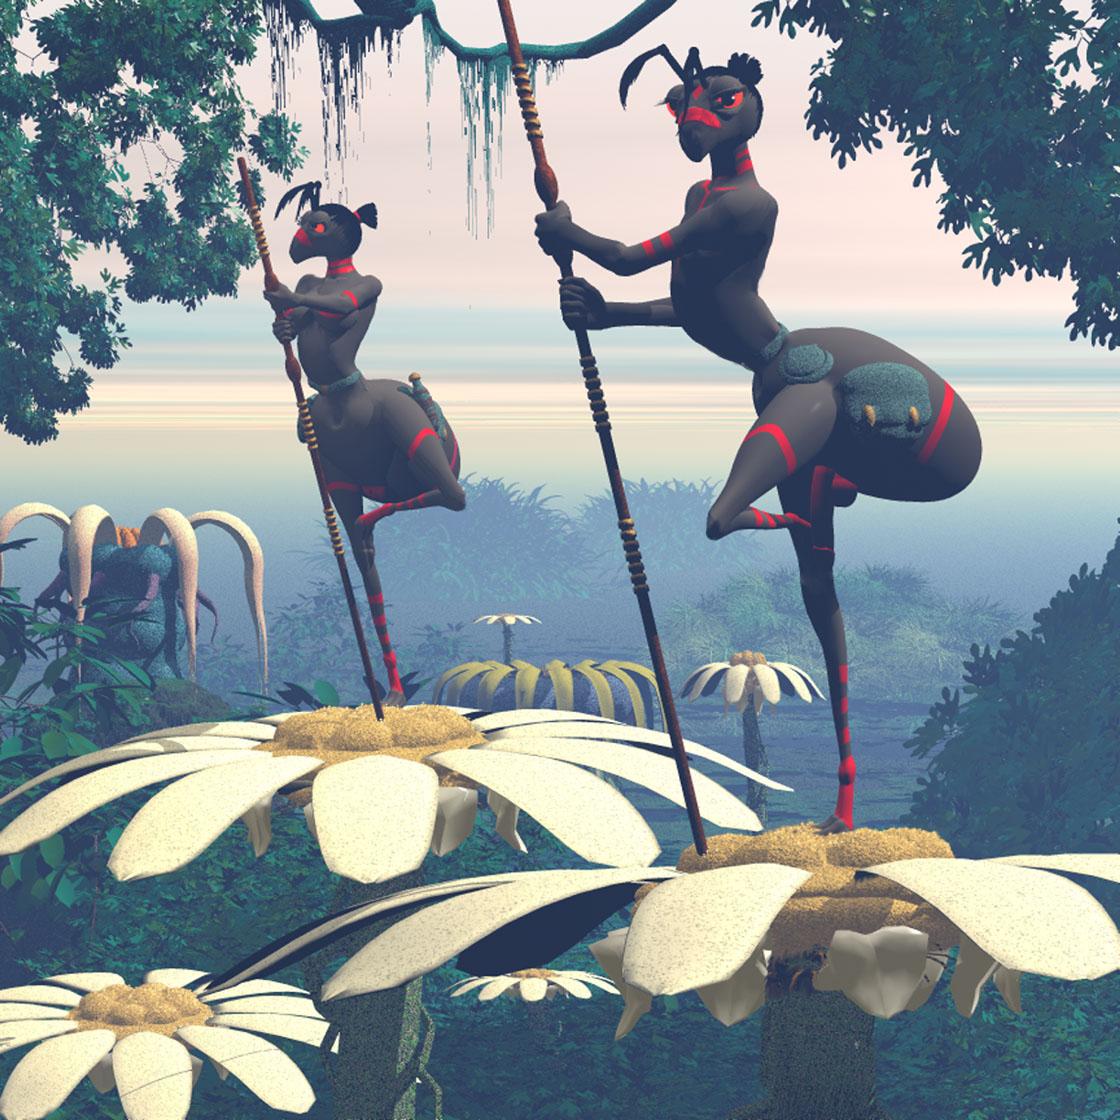 Bonus art: Marabunta sentries